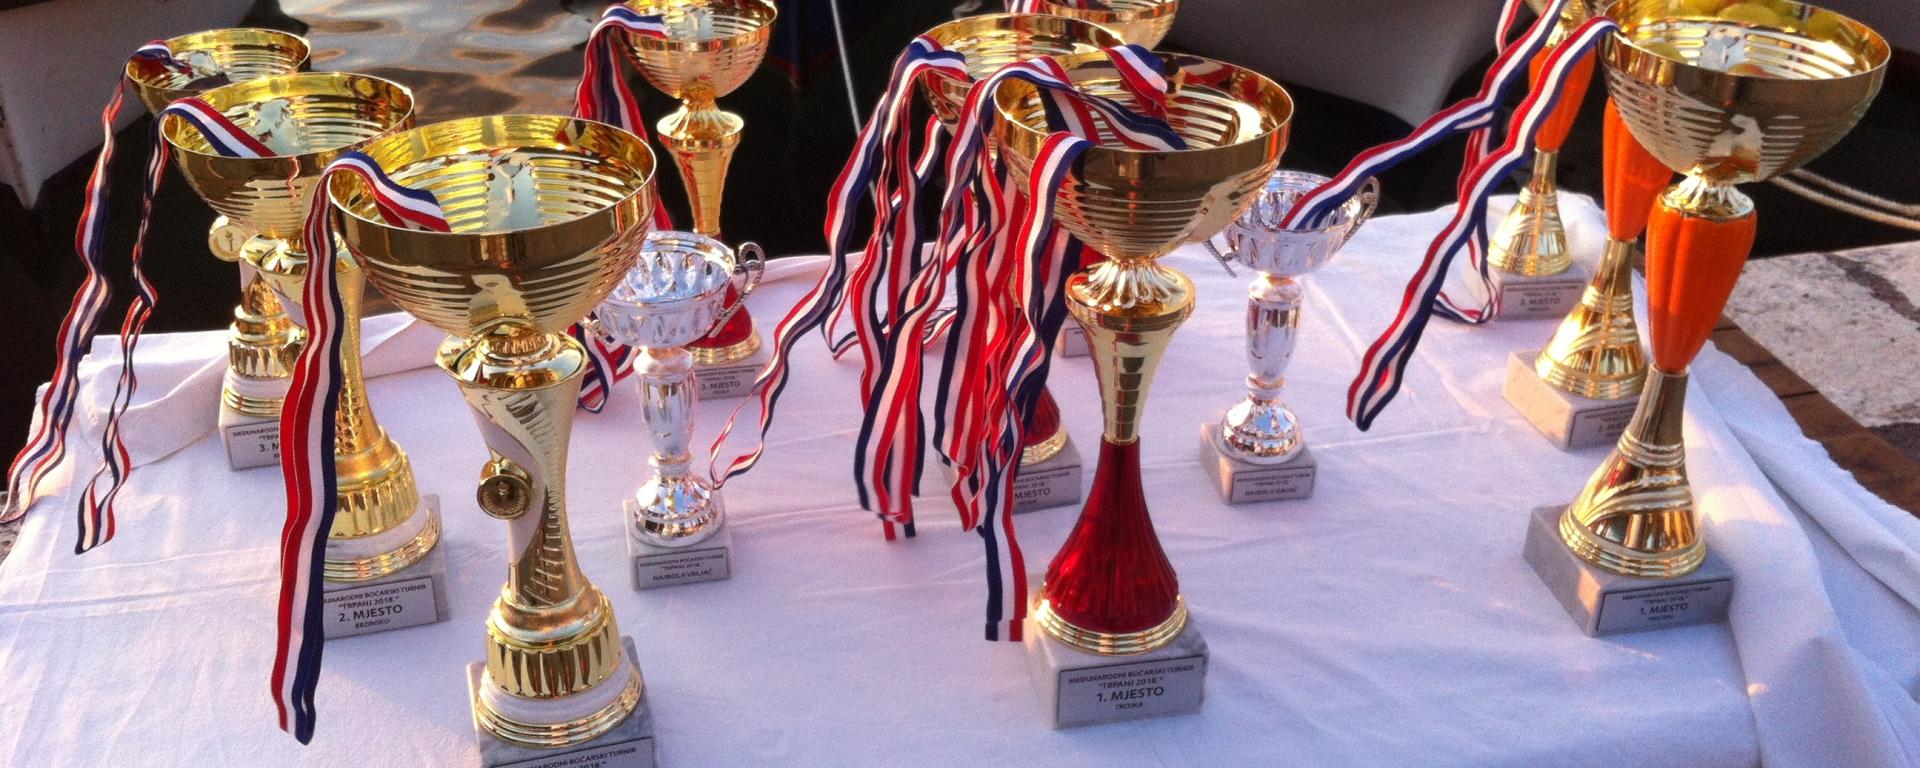 9th International Boccie Tournament Trpanj